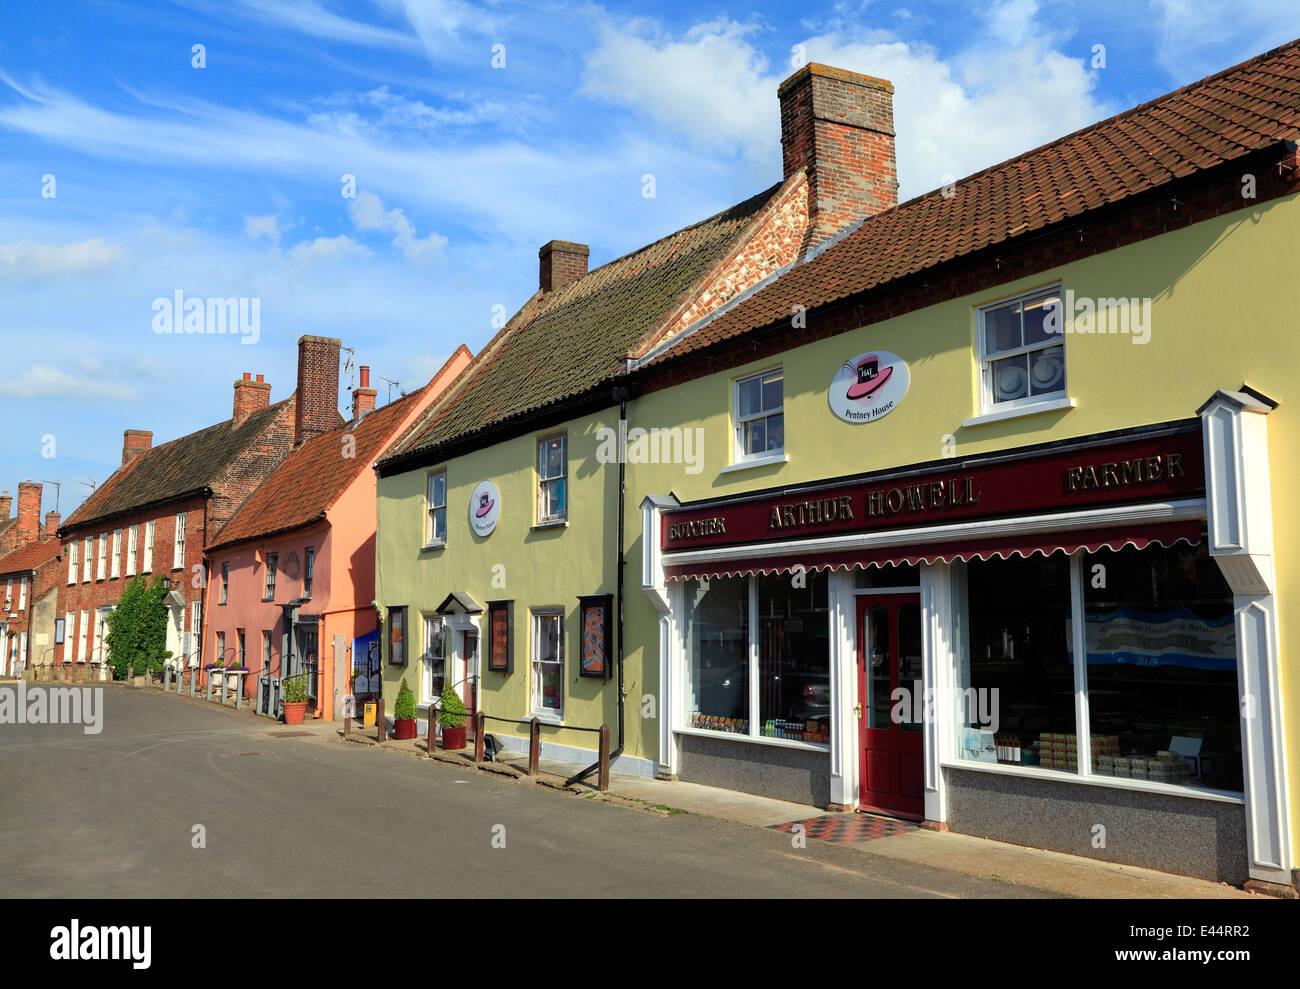 Burnham Market, Norfolk, shops, houses, hotels, England UK - Stock Image